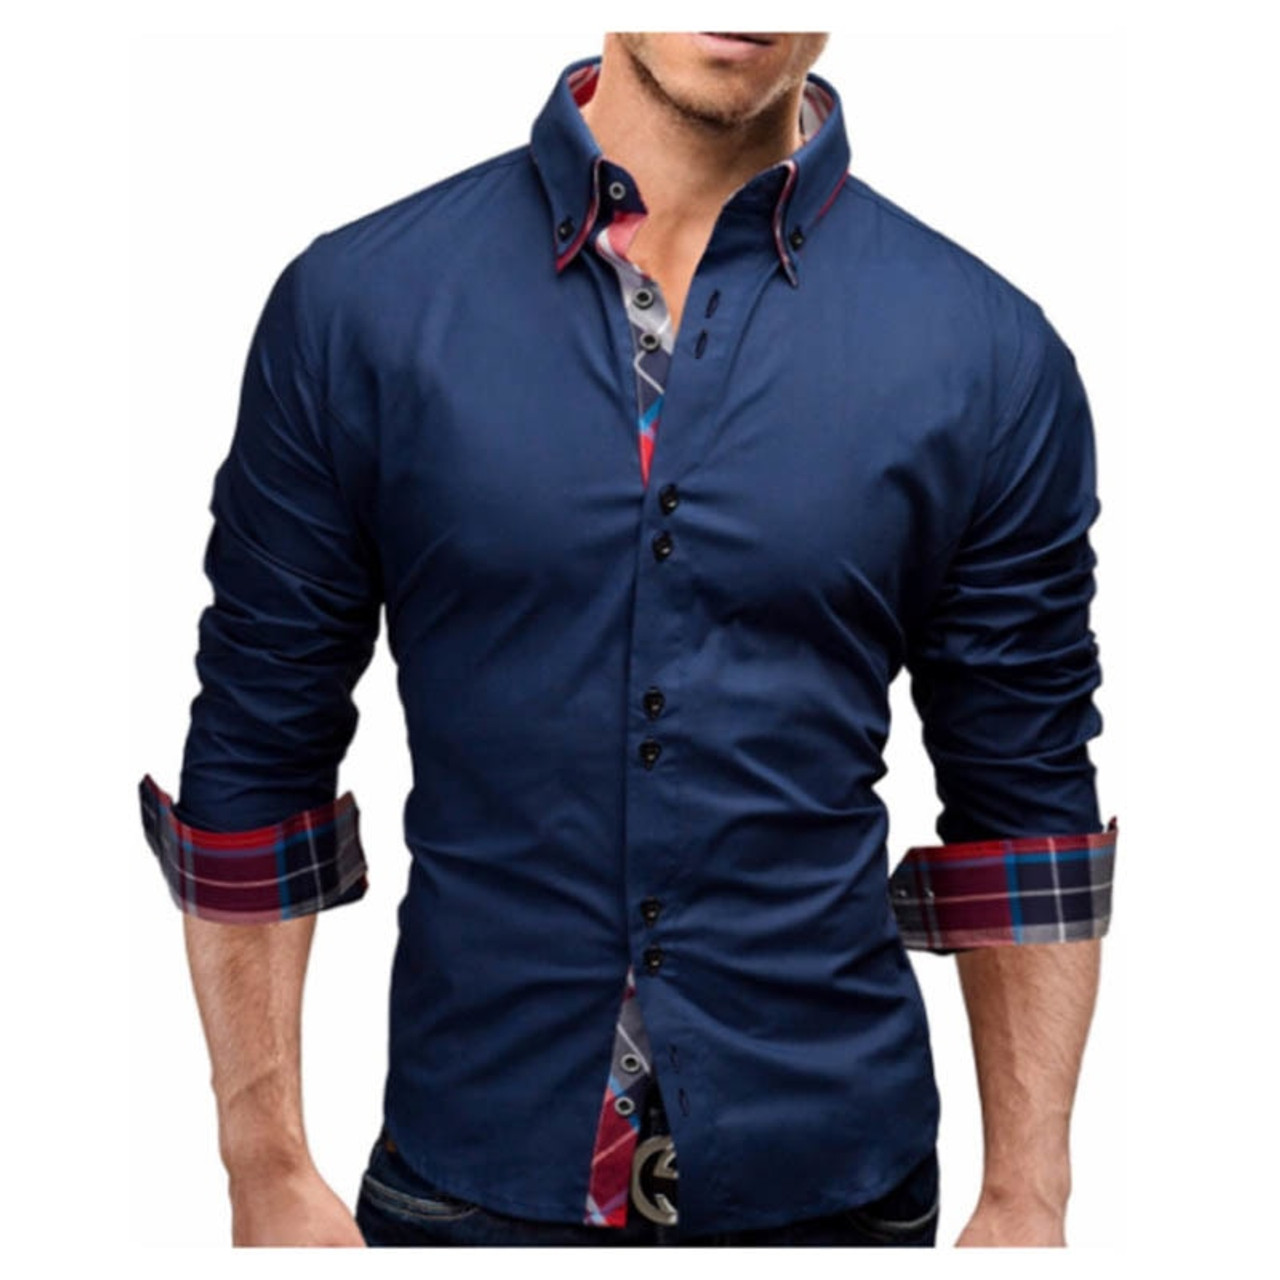 ef707b05f418 ... Men Shirt 2018 Spring New Brand Business Men'S Slim Fit Dress Shirt  Male Long Sleeves Casual ...